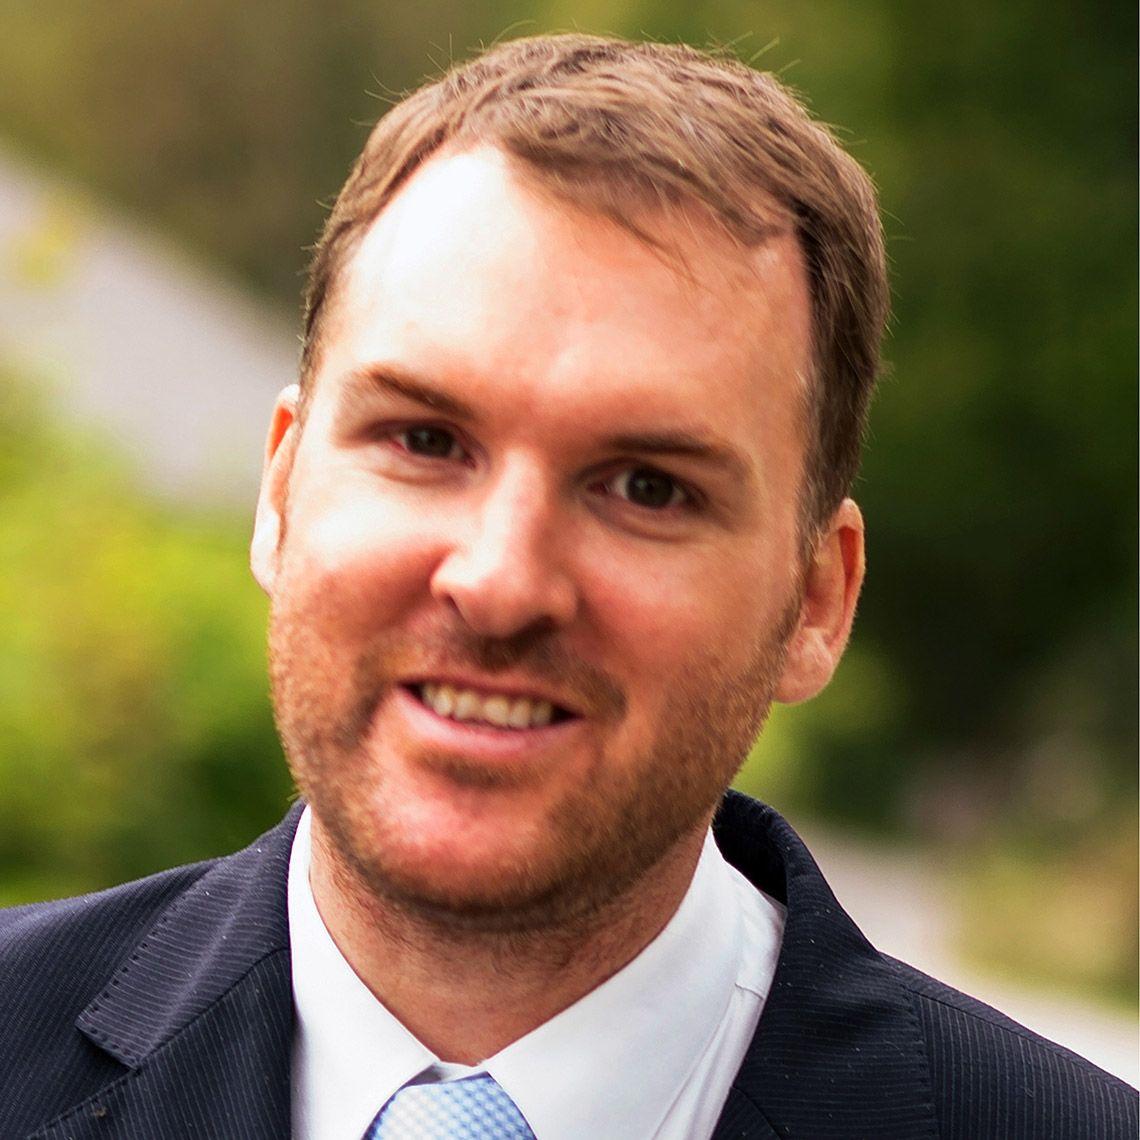 Dr Tobias Brummaier